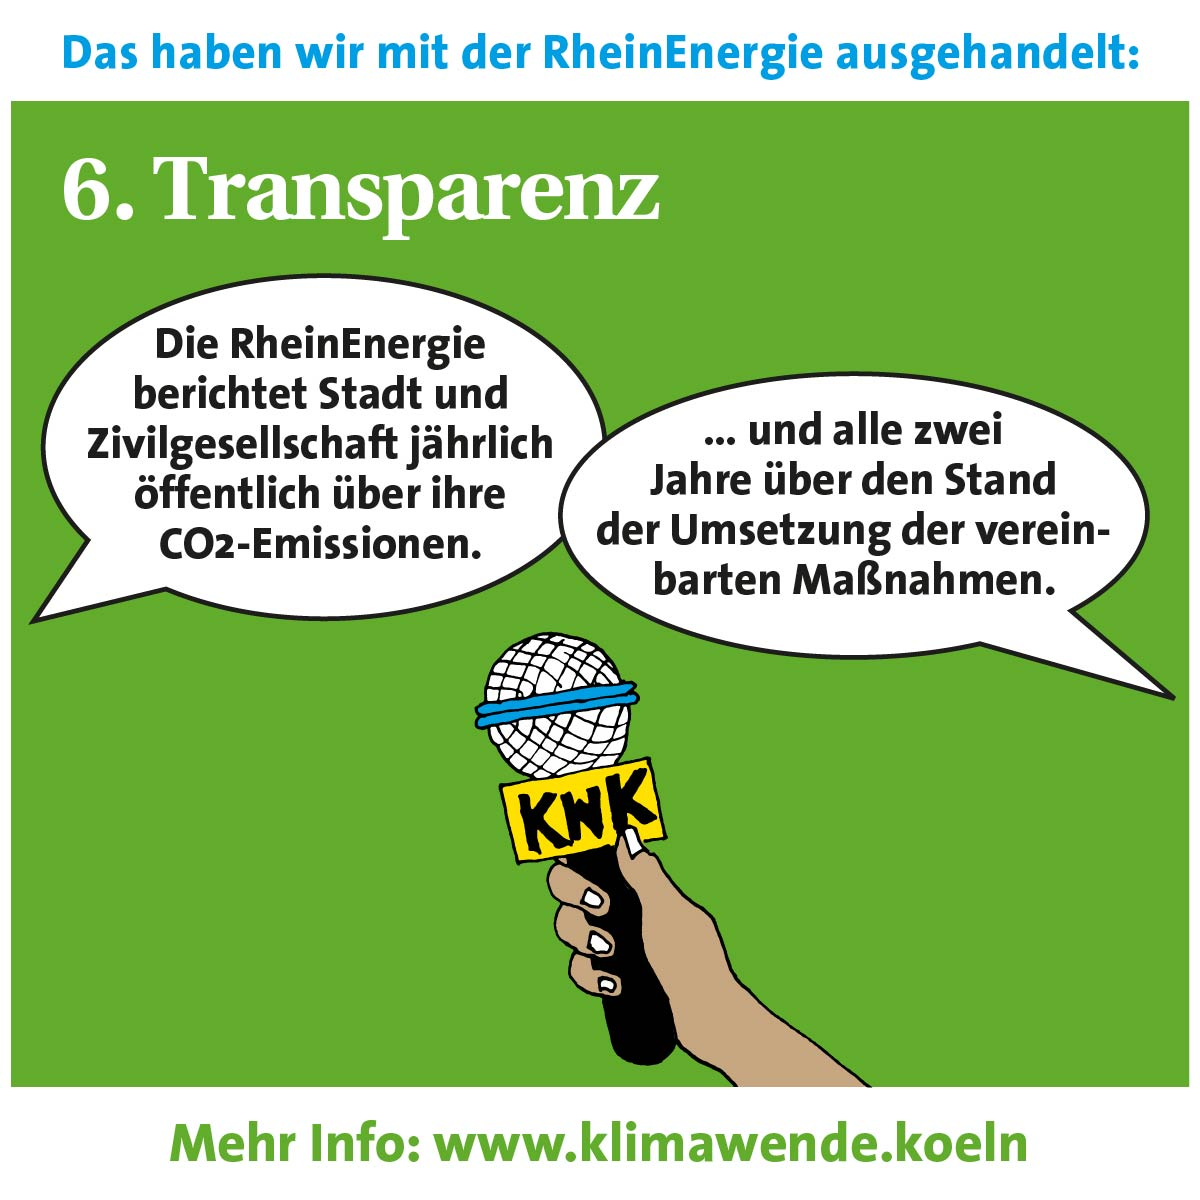 Kernpunkte: 6) Transparenz